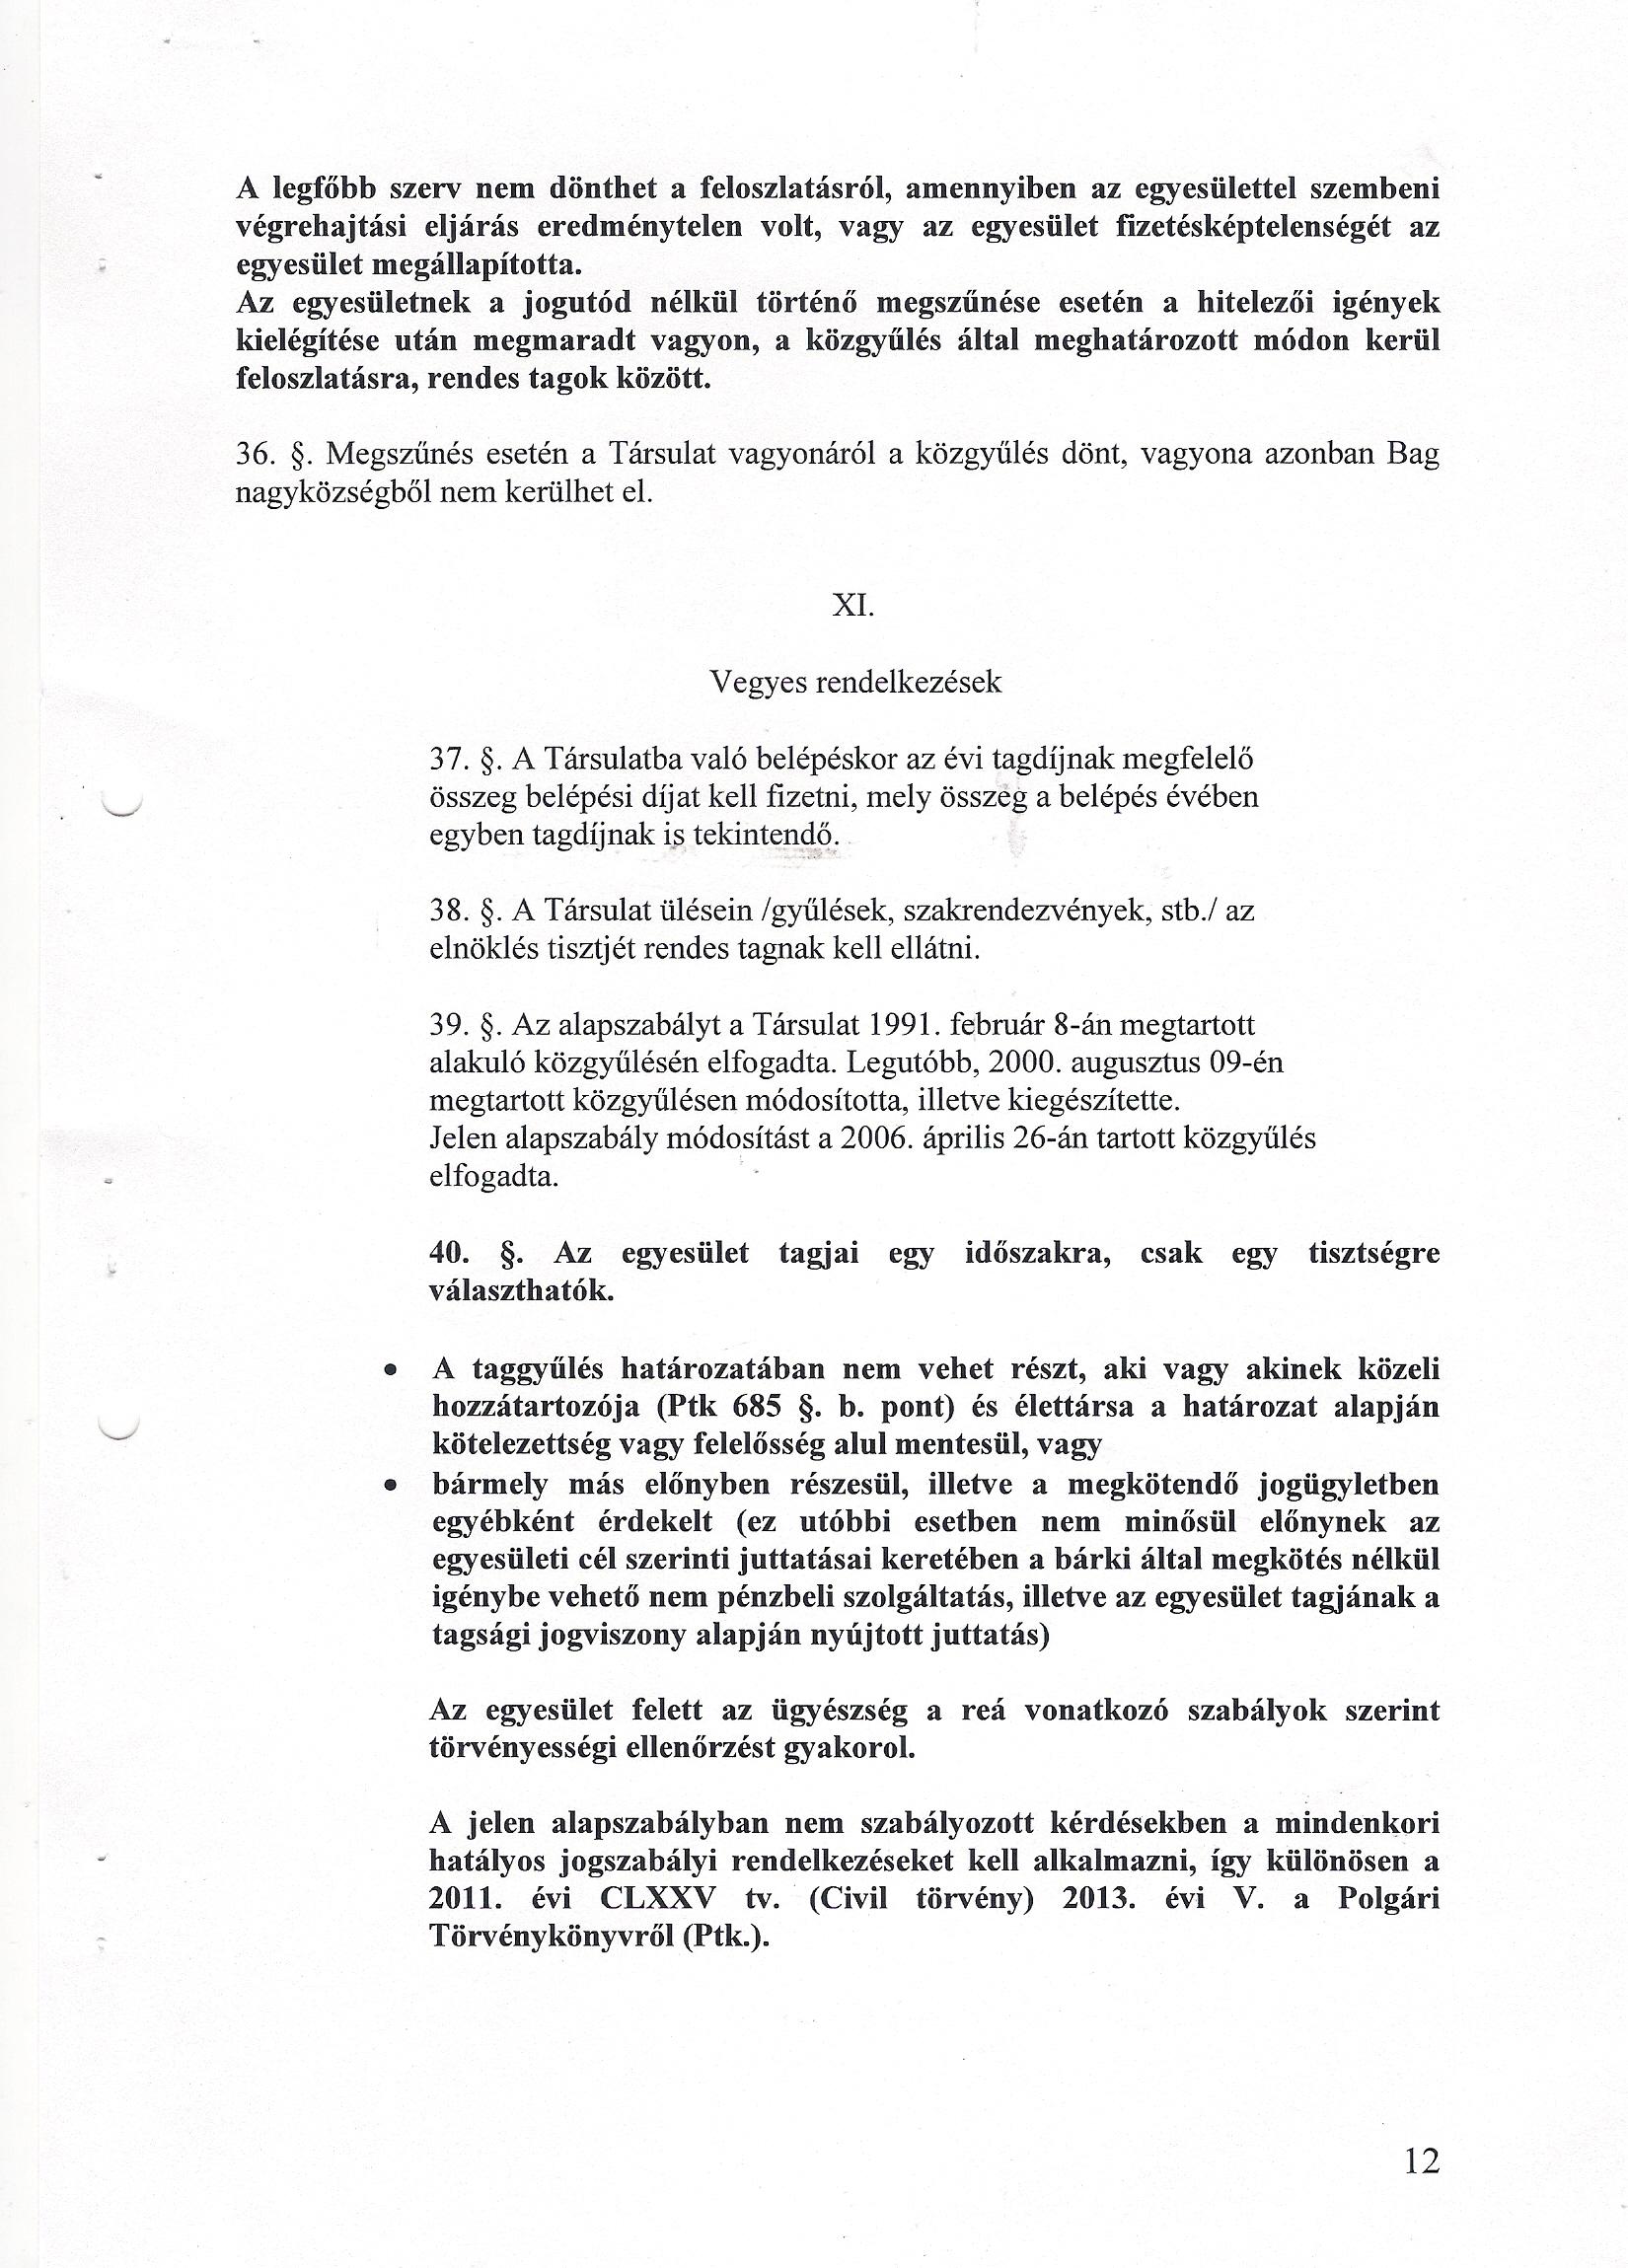 A. 12.